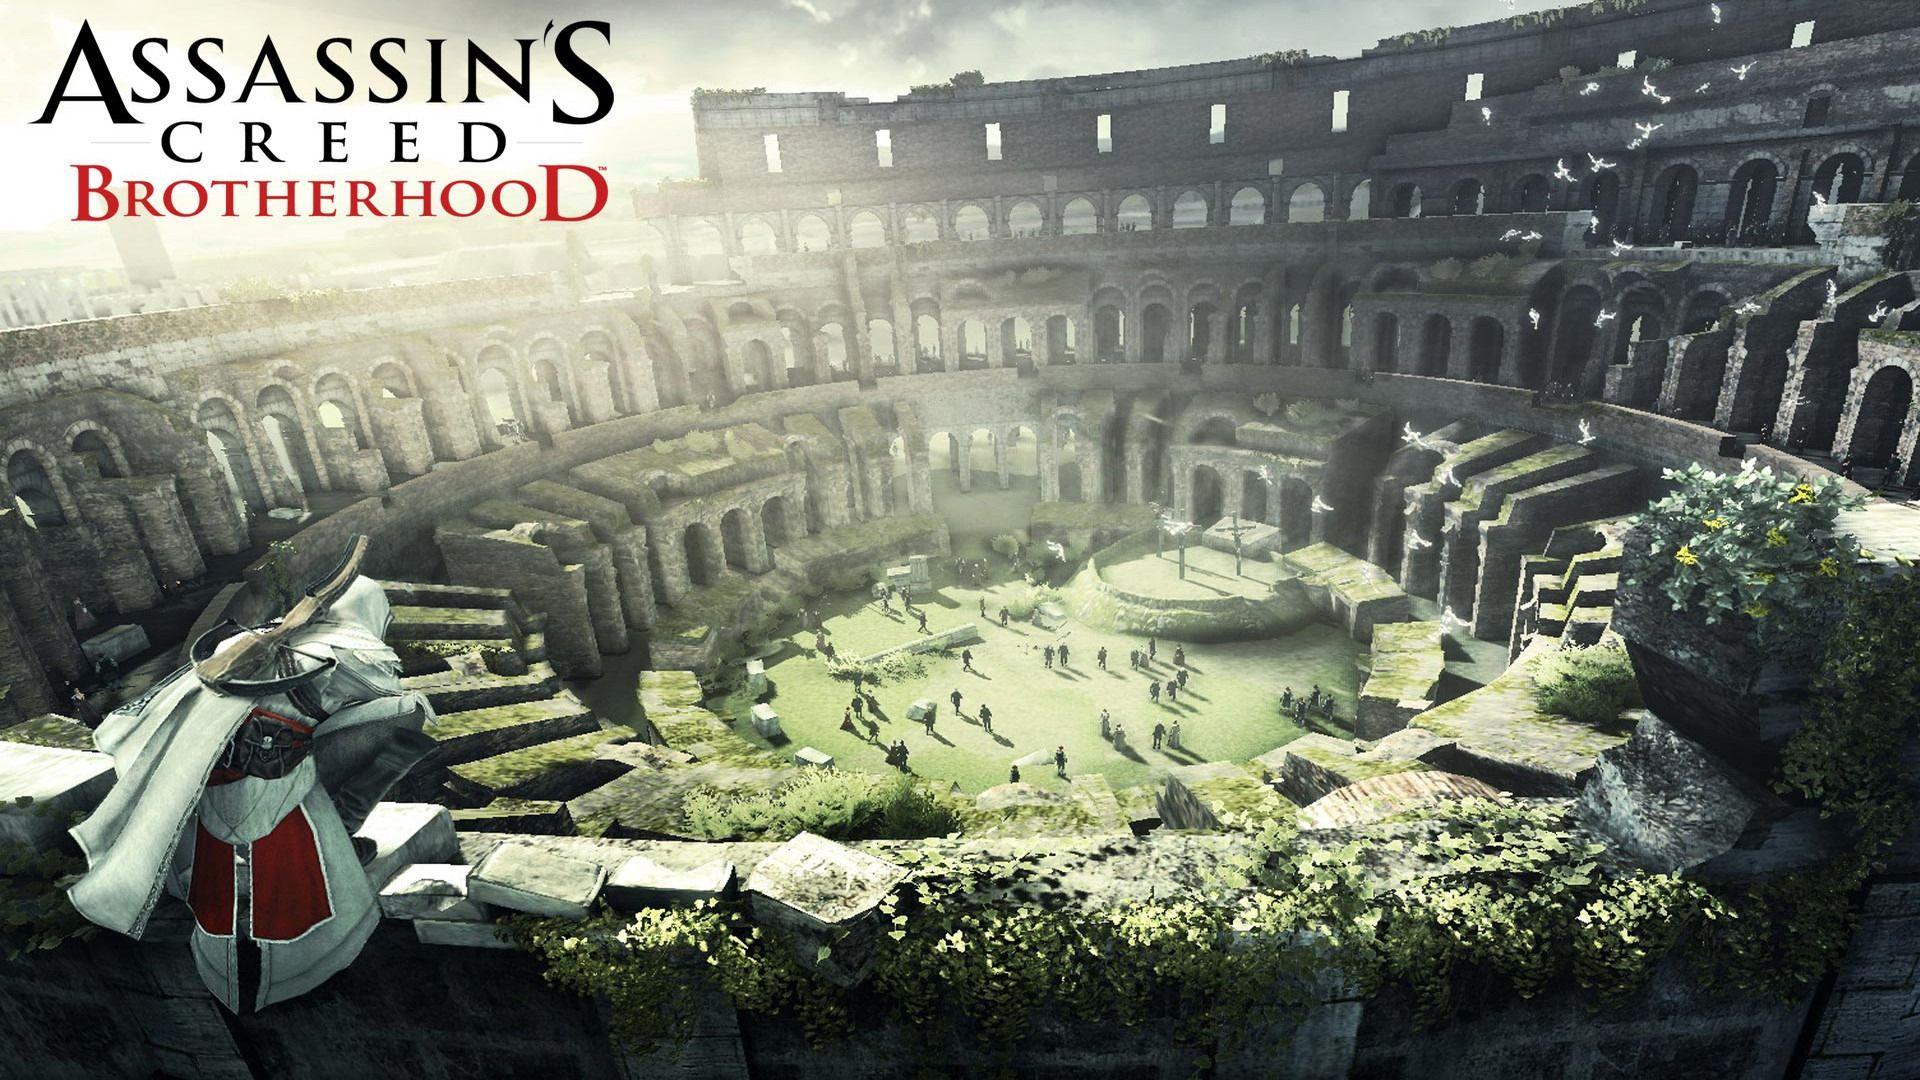 Assassins Creed Brotherhood Ruins